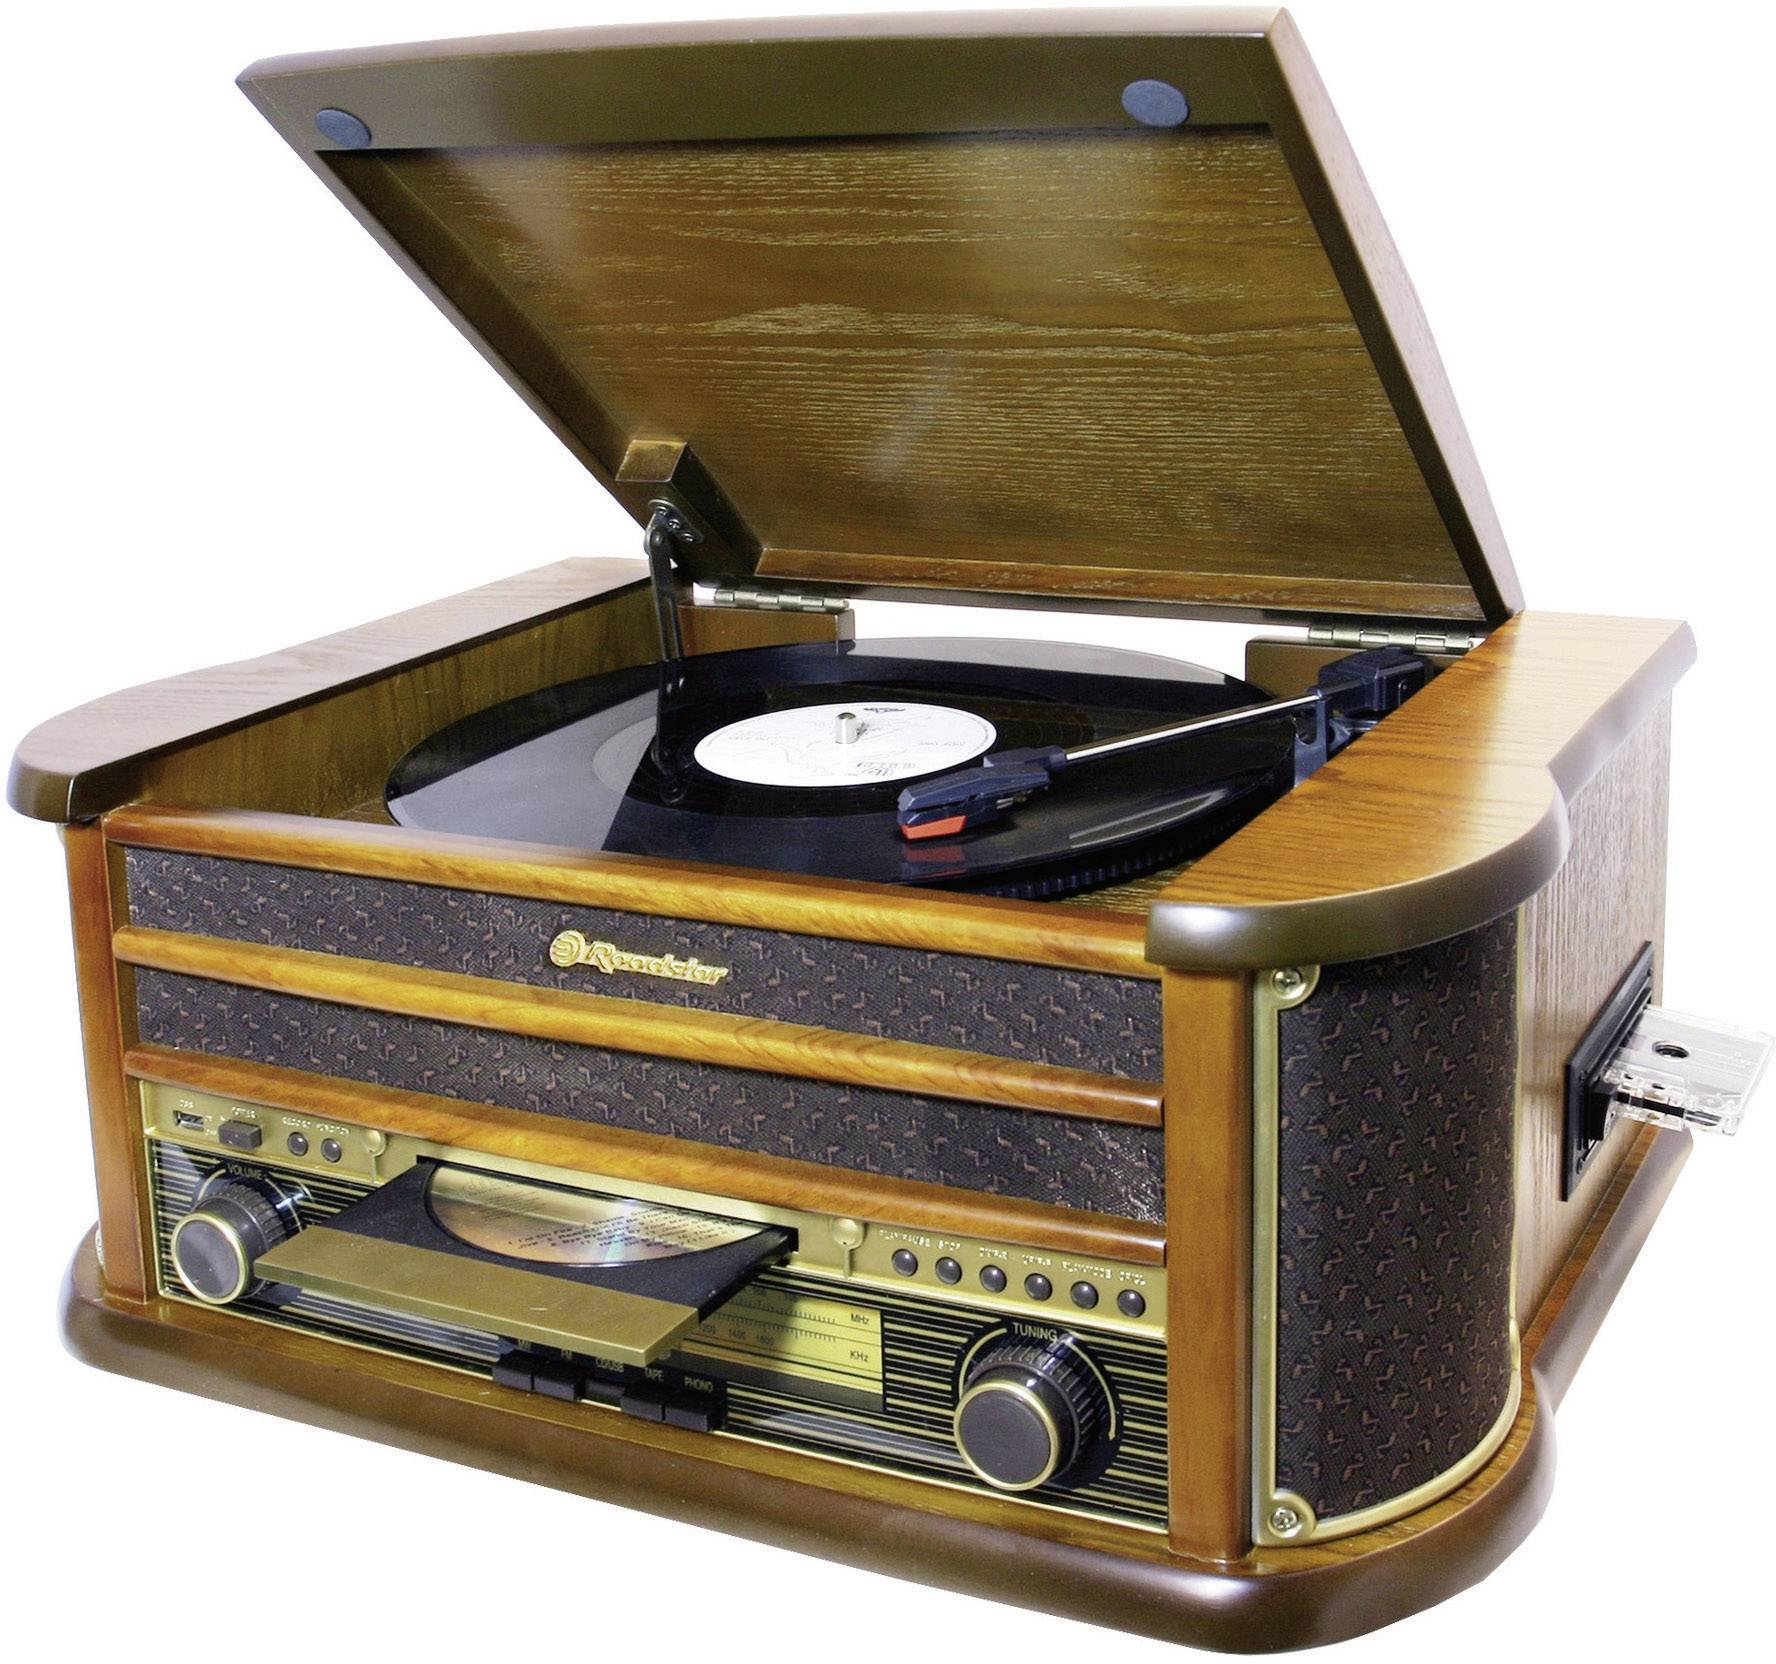 Retro USB gramofón s funkciou digitalizácie Roadstar HIF-1923TUMPK